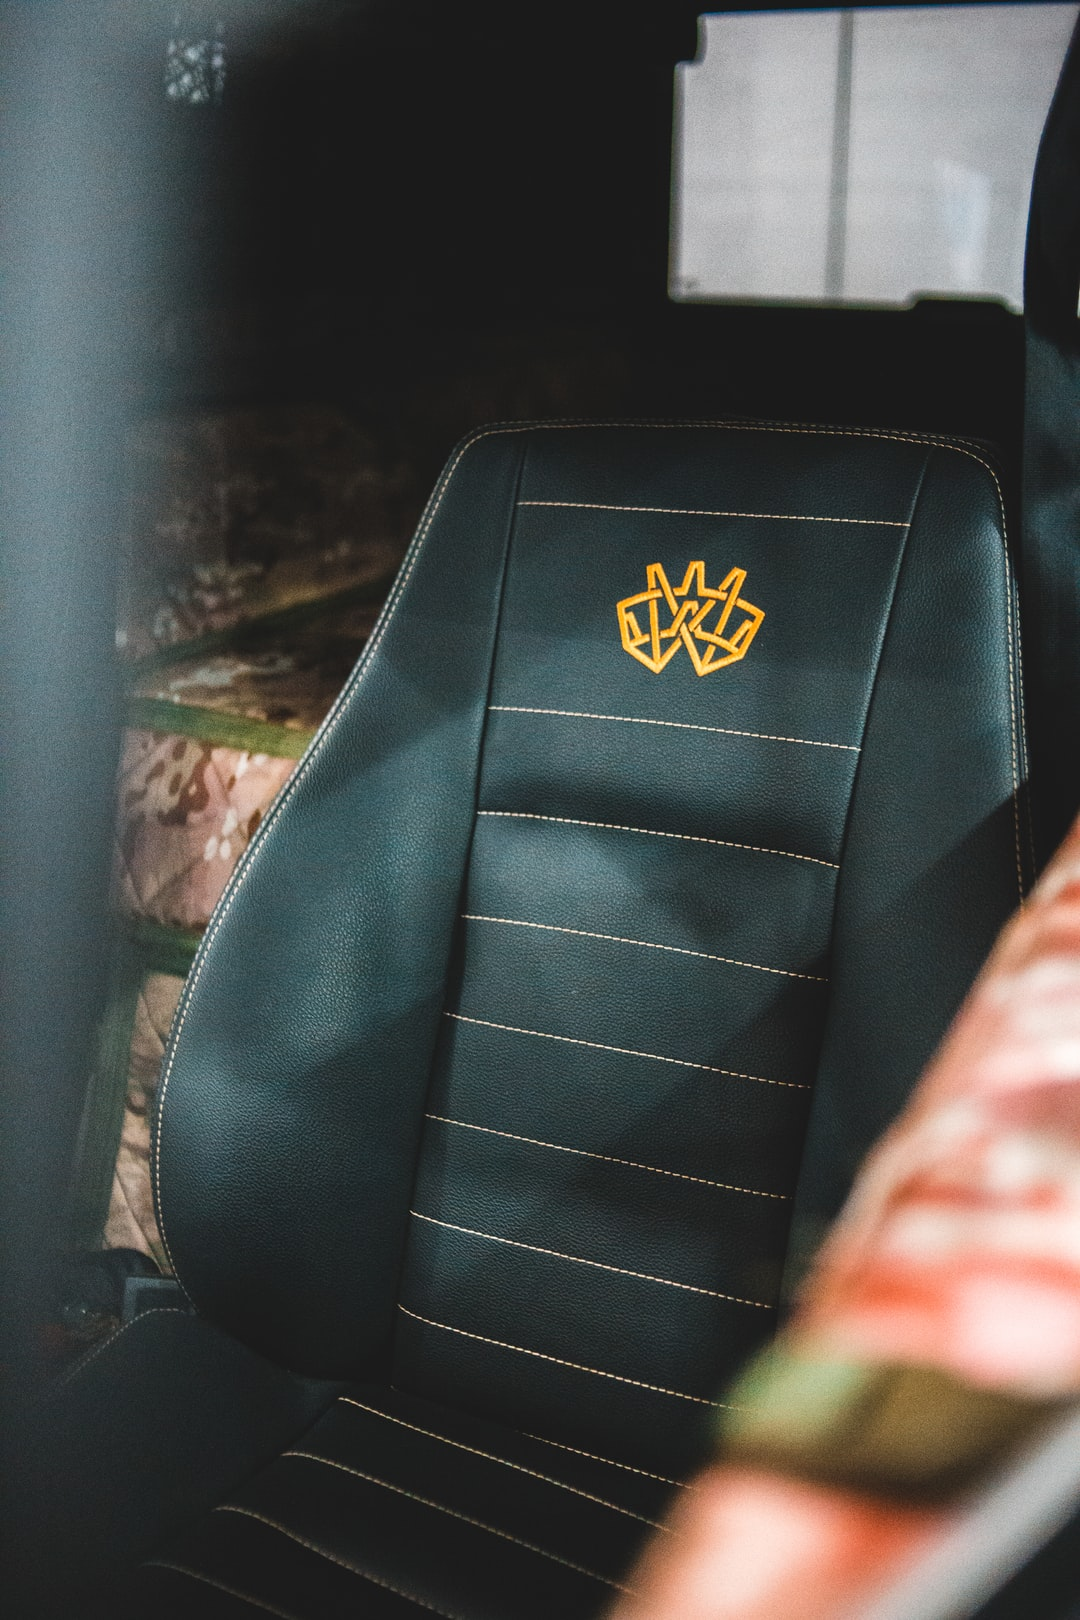 Office Ergonomics: Why You Need a Memory Foam Seat Cushion